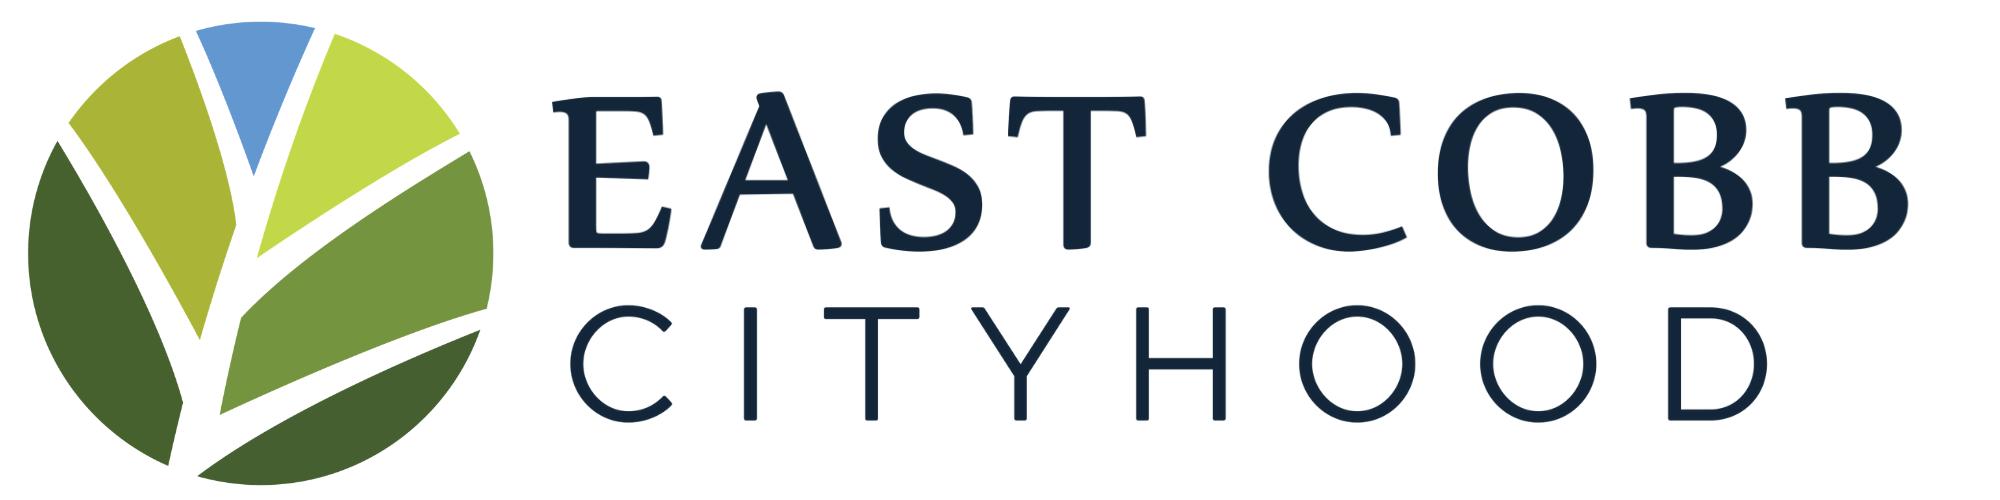 East Cobb Cityhood